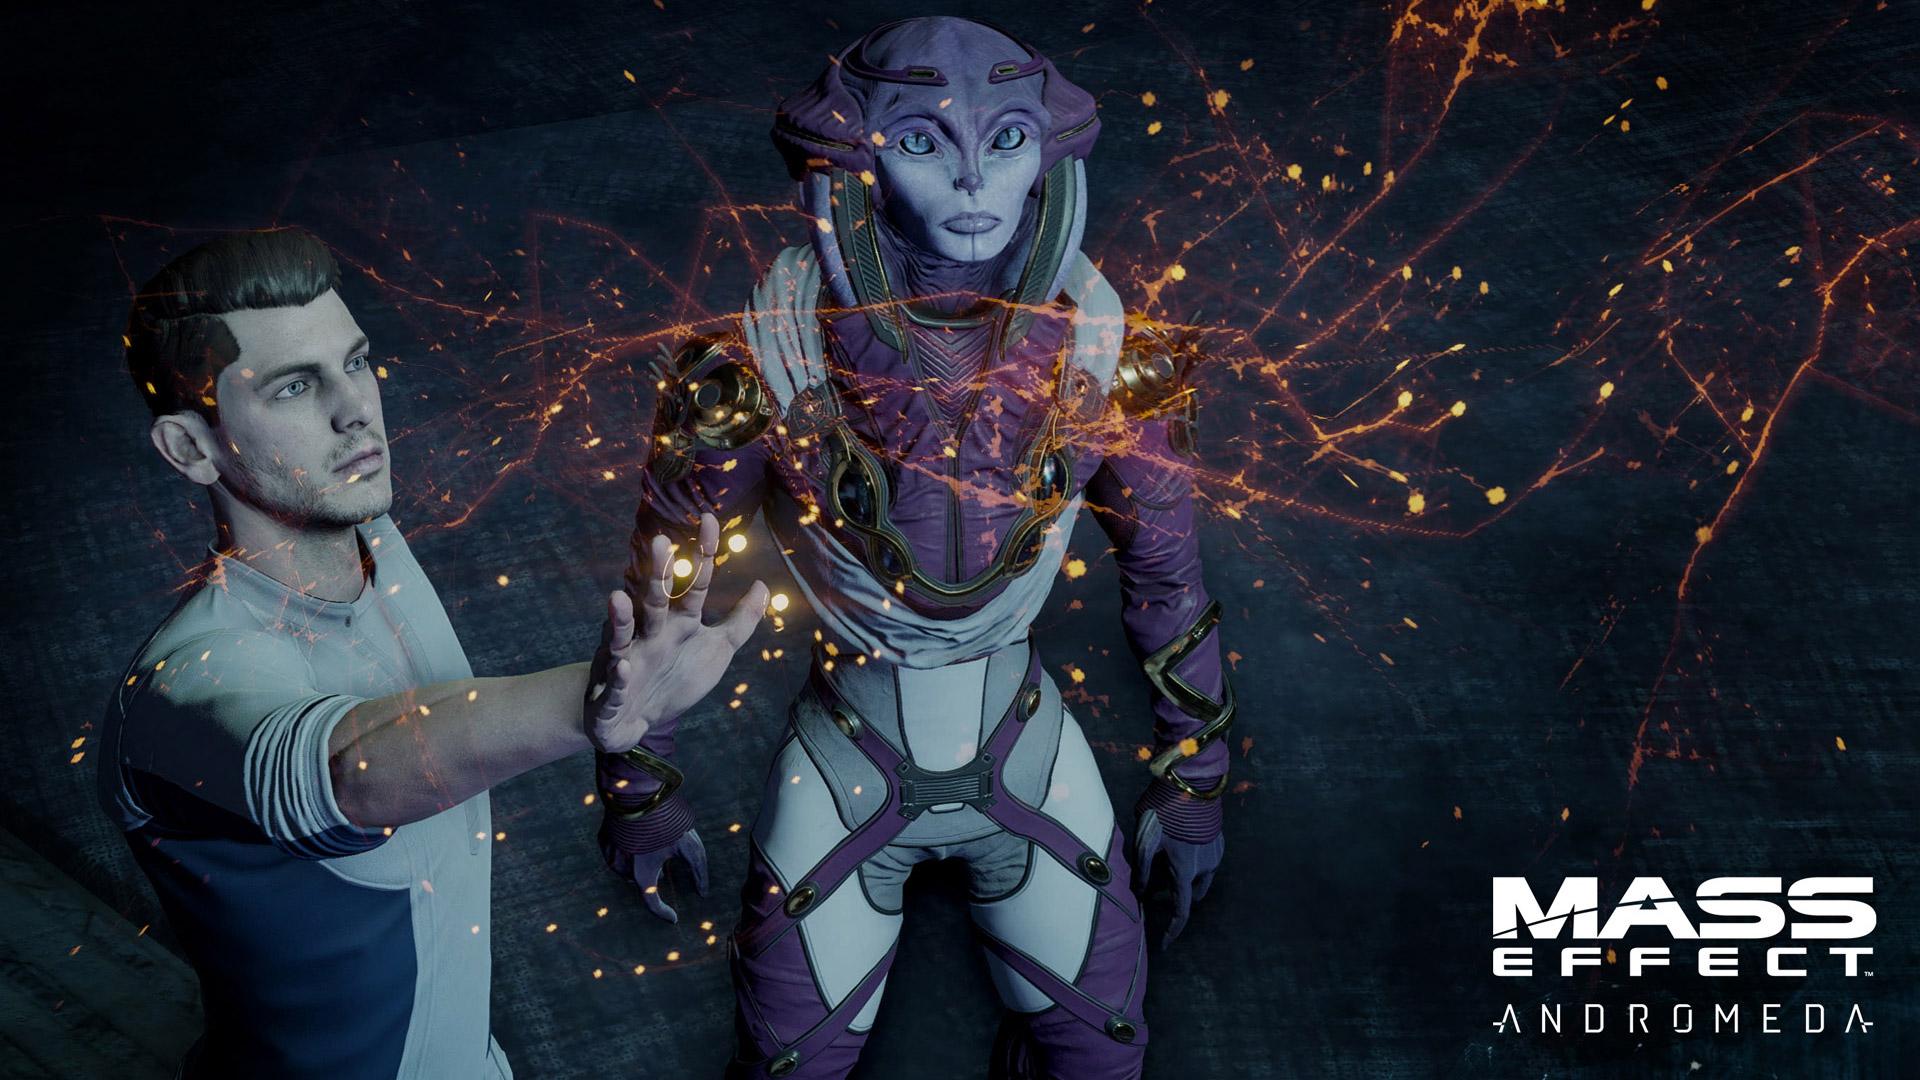 Mass Effect: Andromeda Wallpaper in 1920x1080